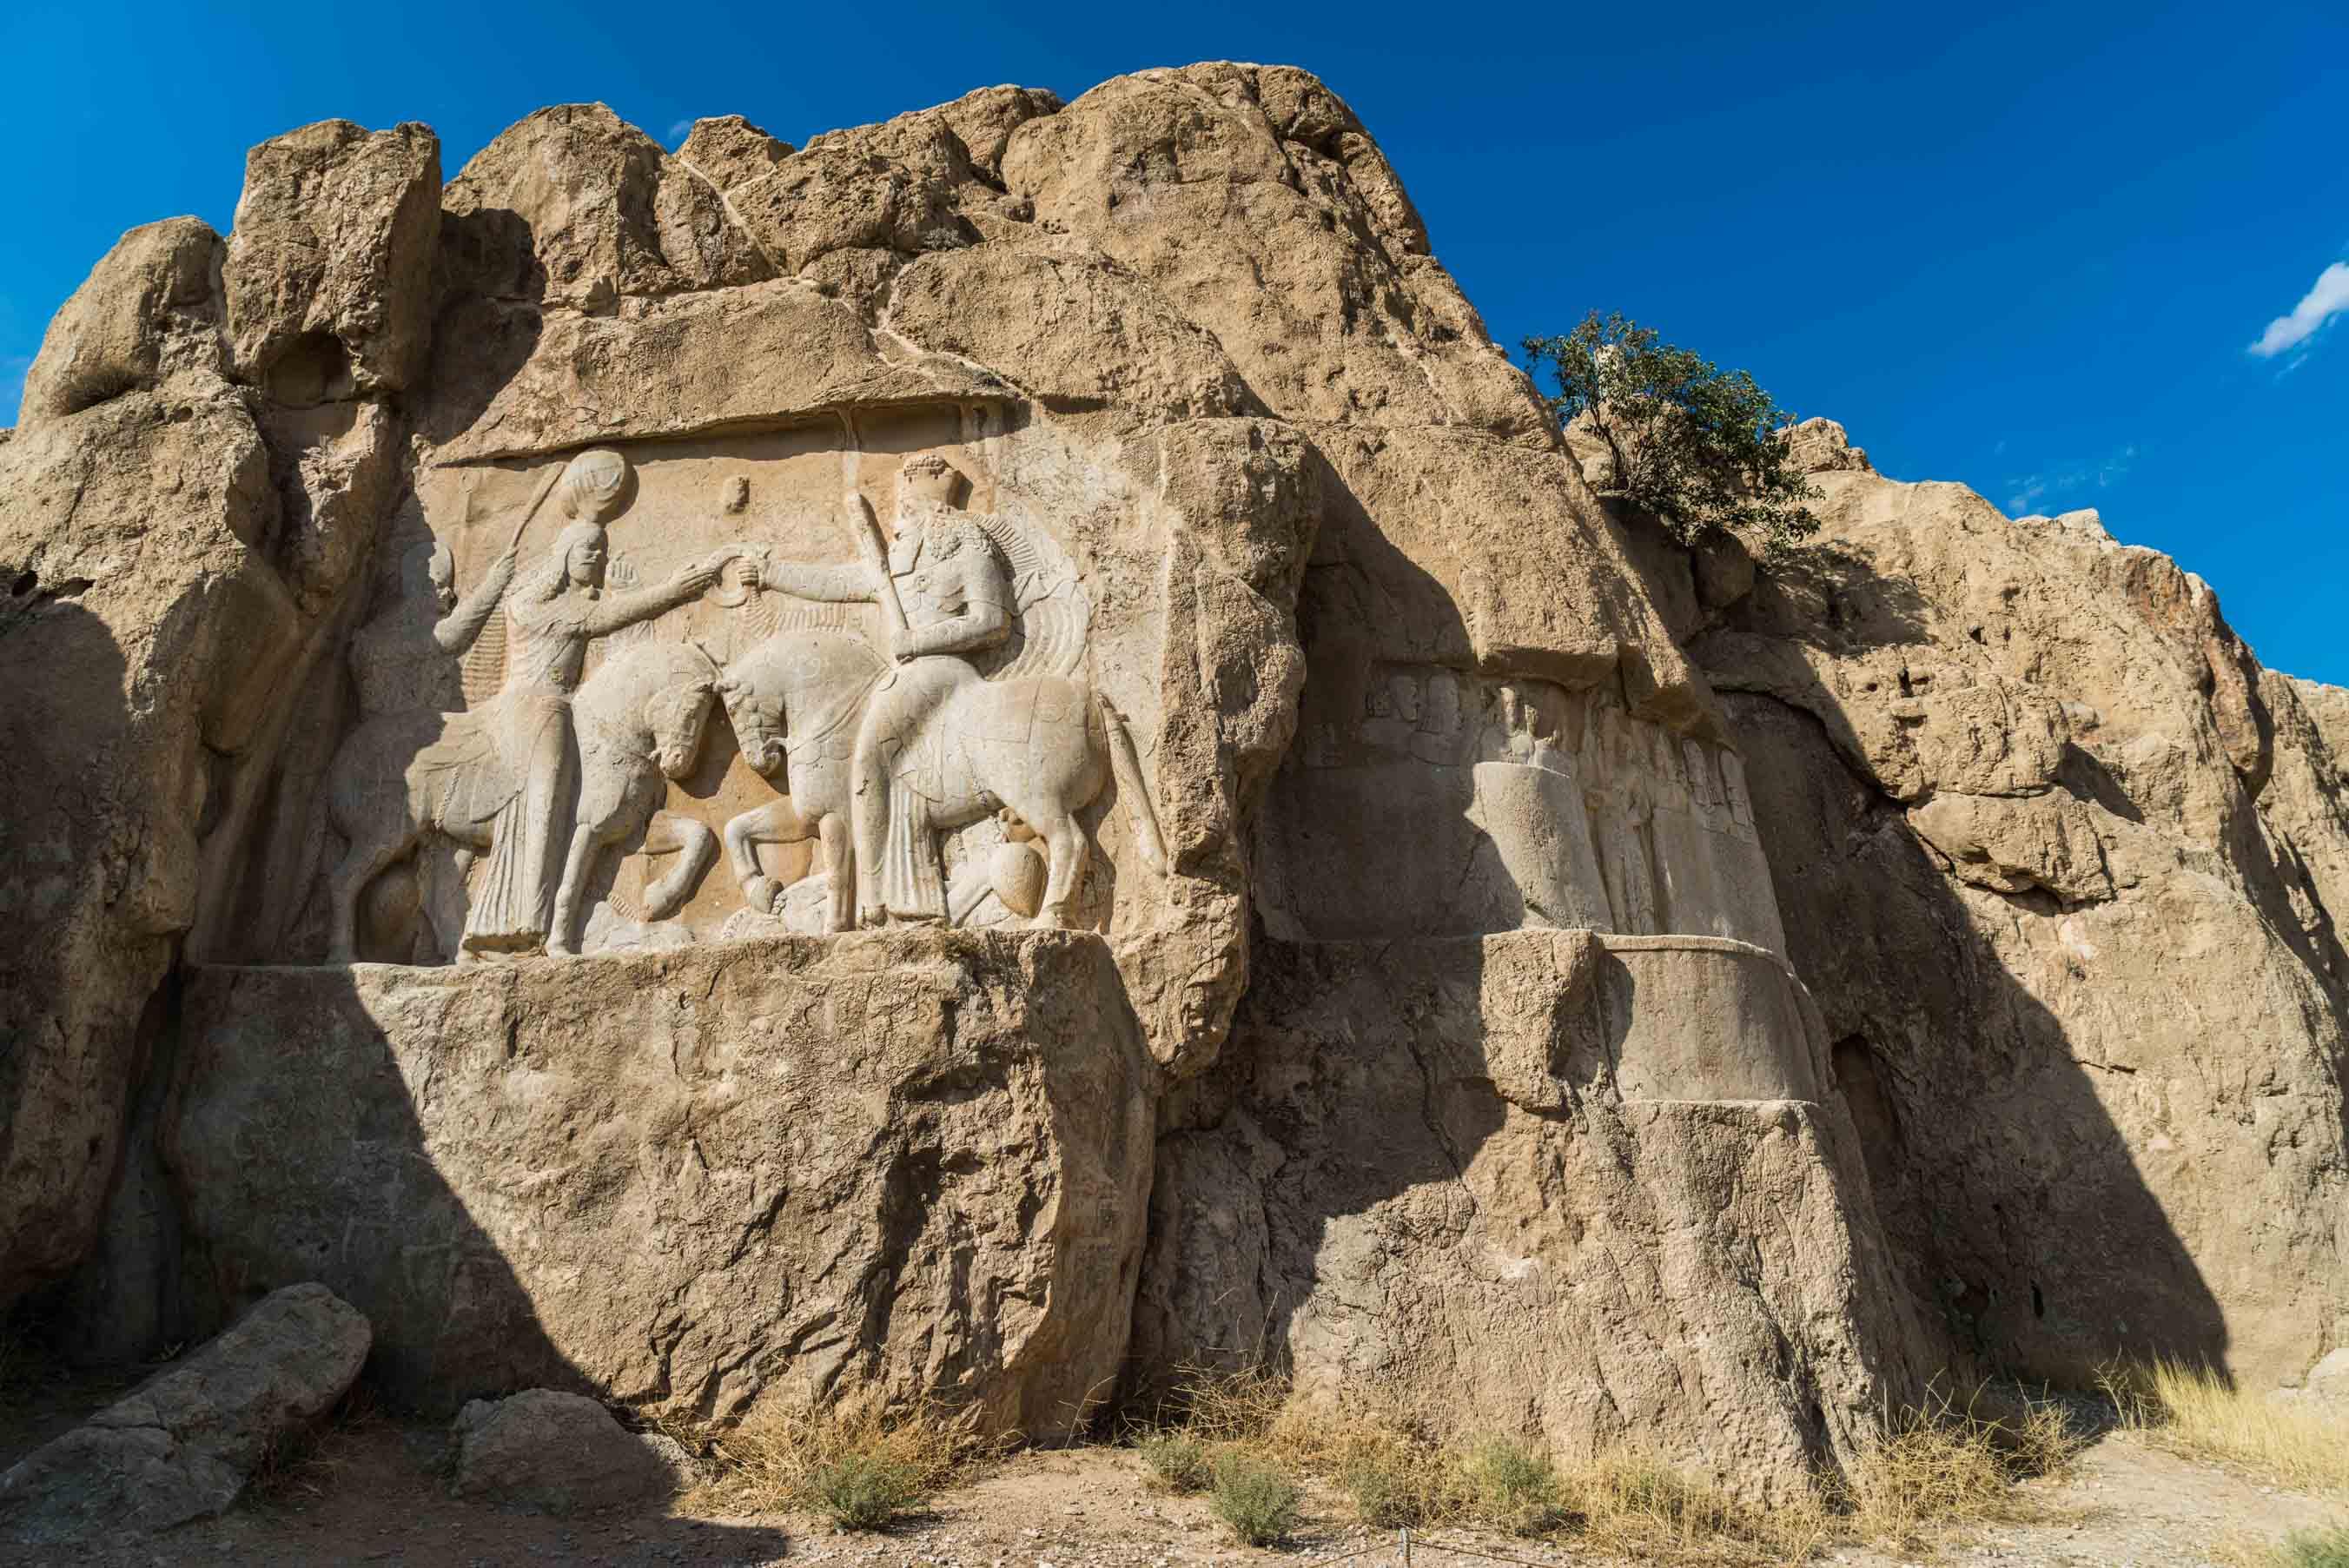 Persepolis Iran - Naqsh-e Rajab